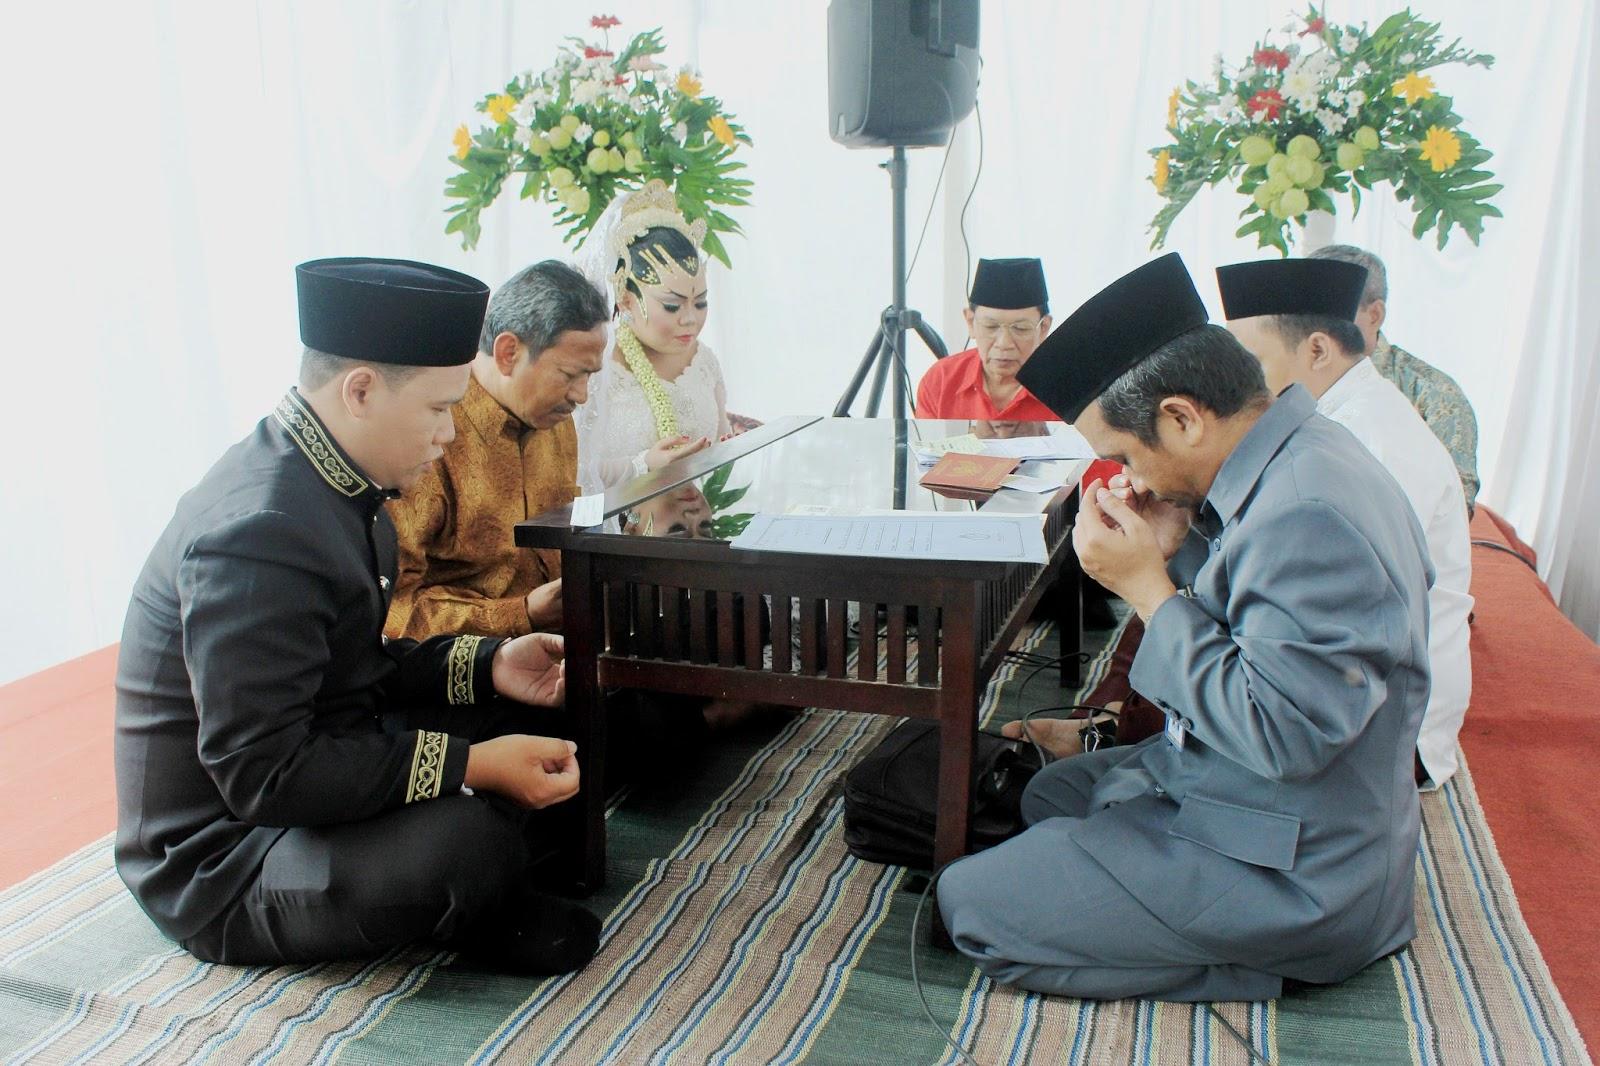 Jasa foto wedding semarang